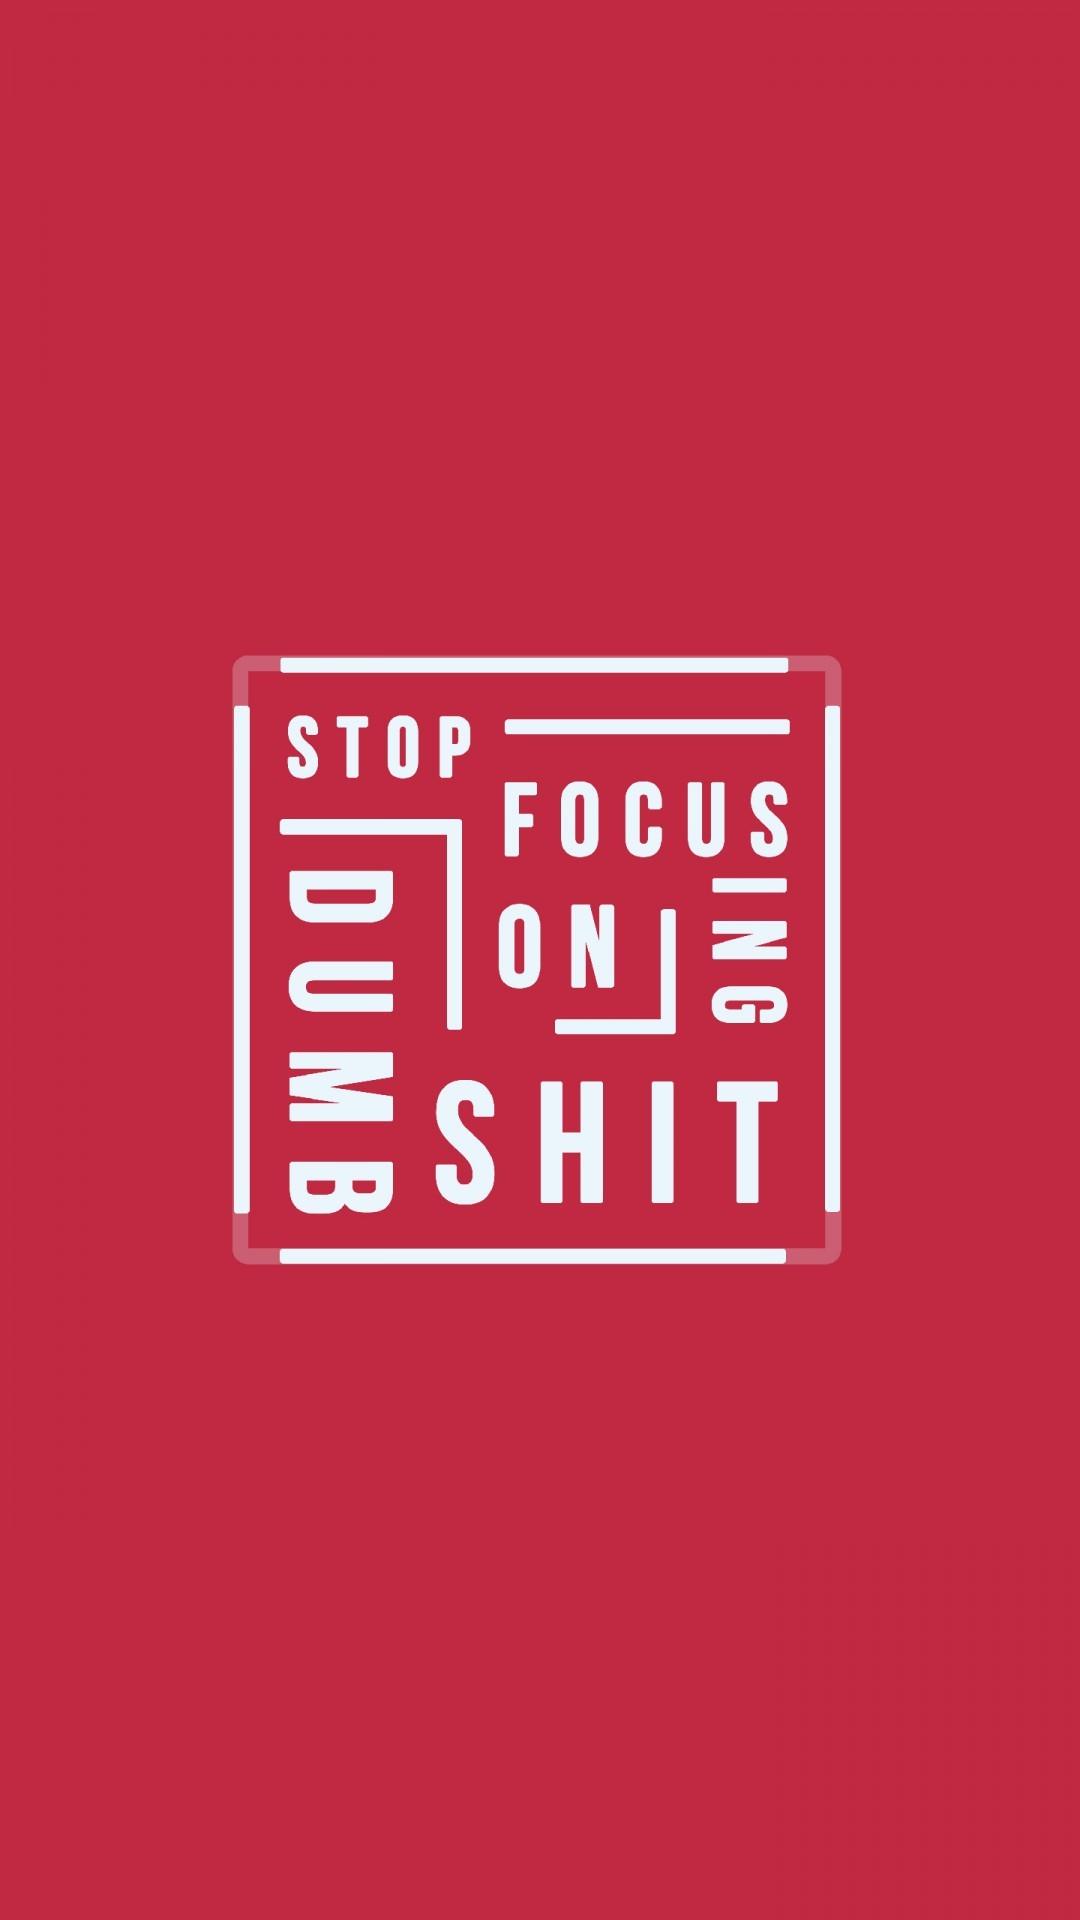 Free Stop focusing on Dumb sh*t phone wallpaper by mackaye115